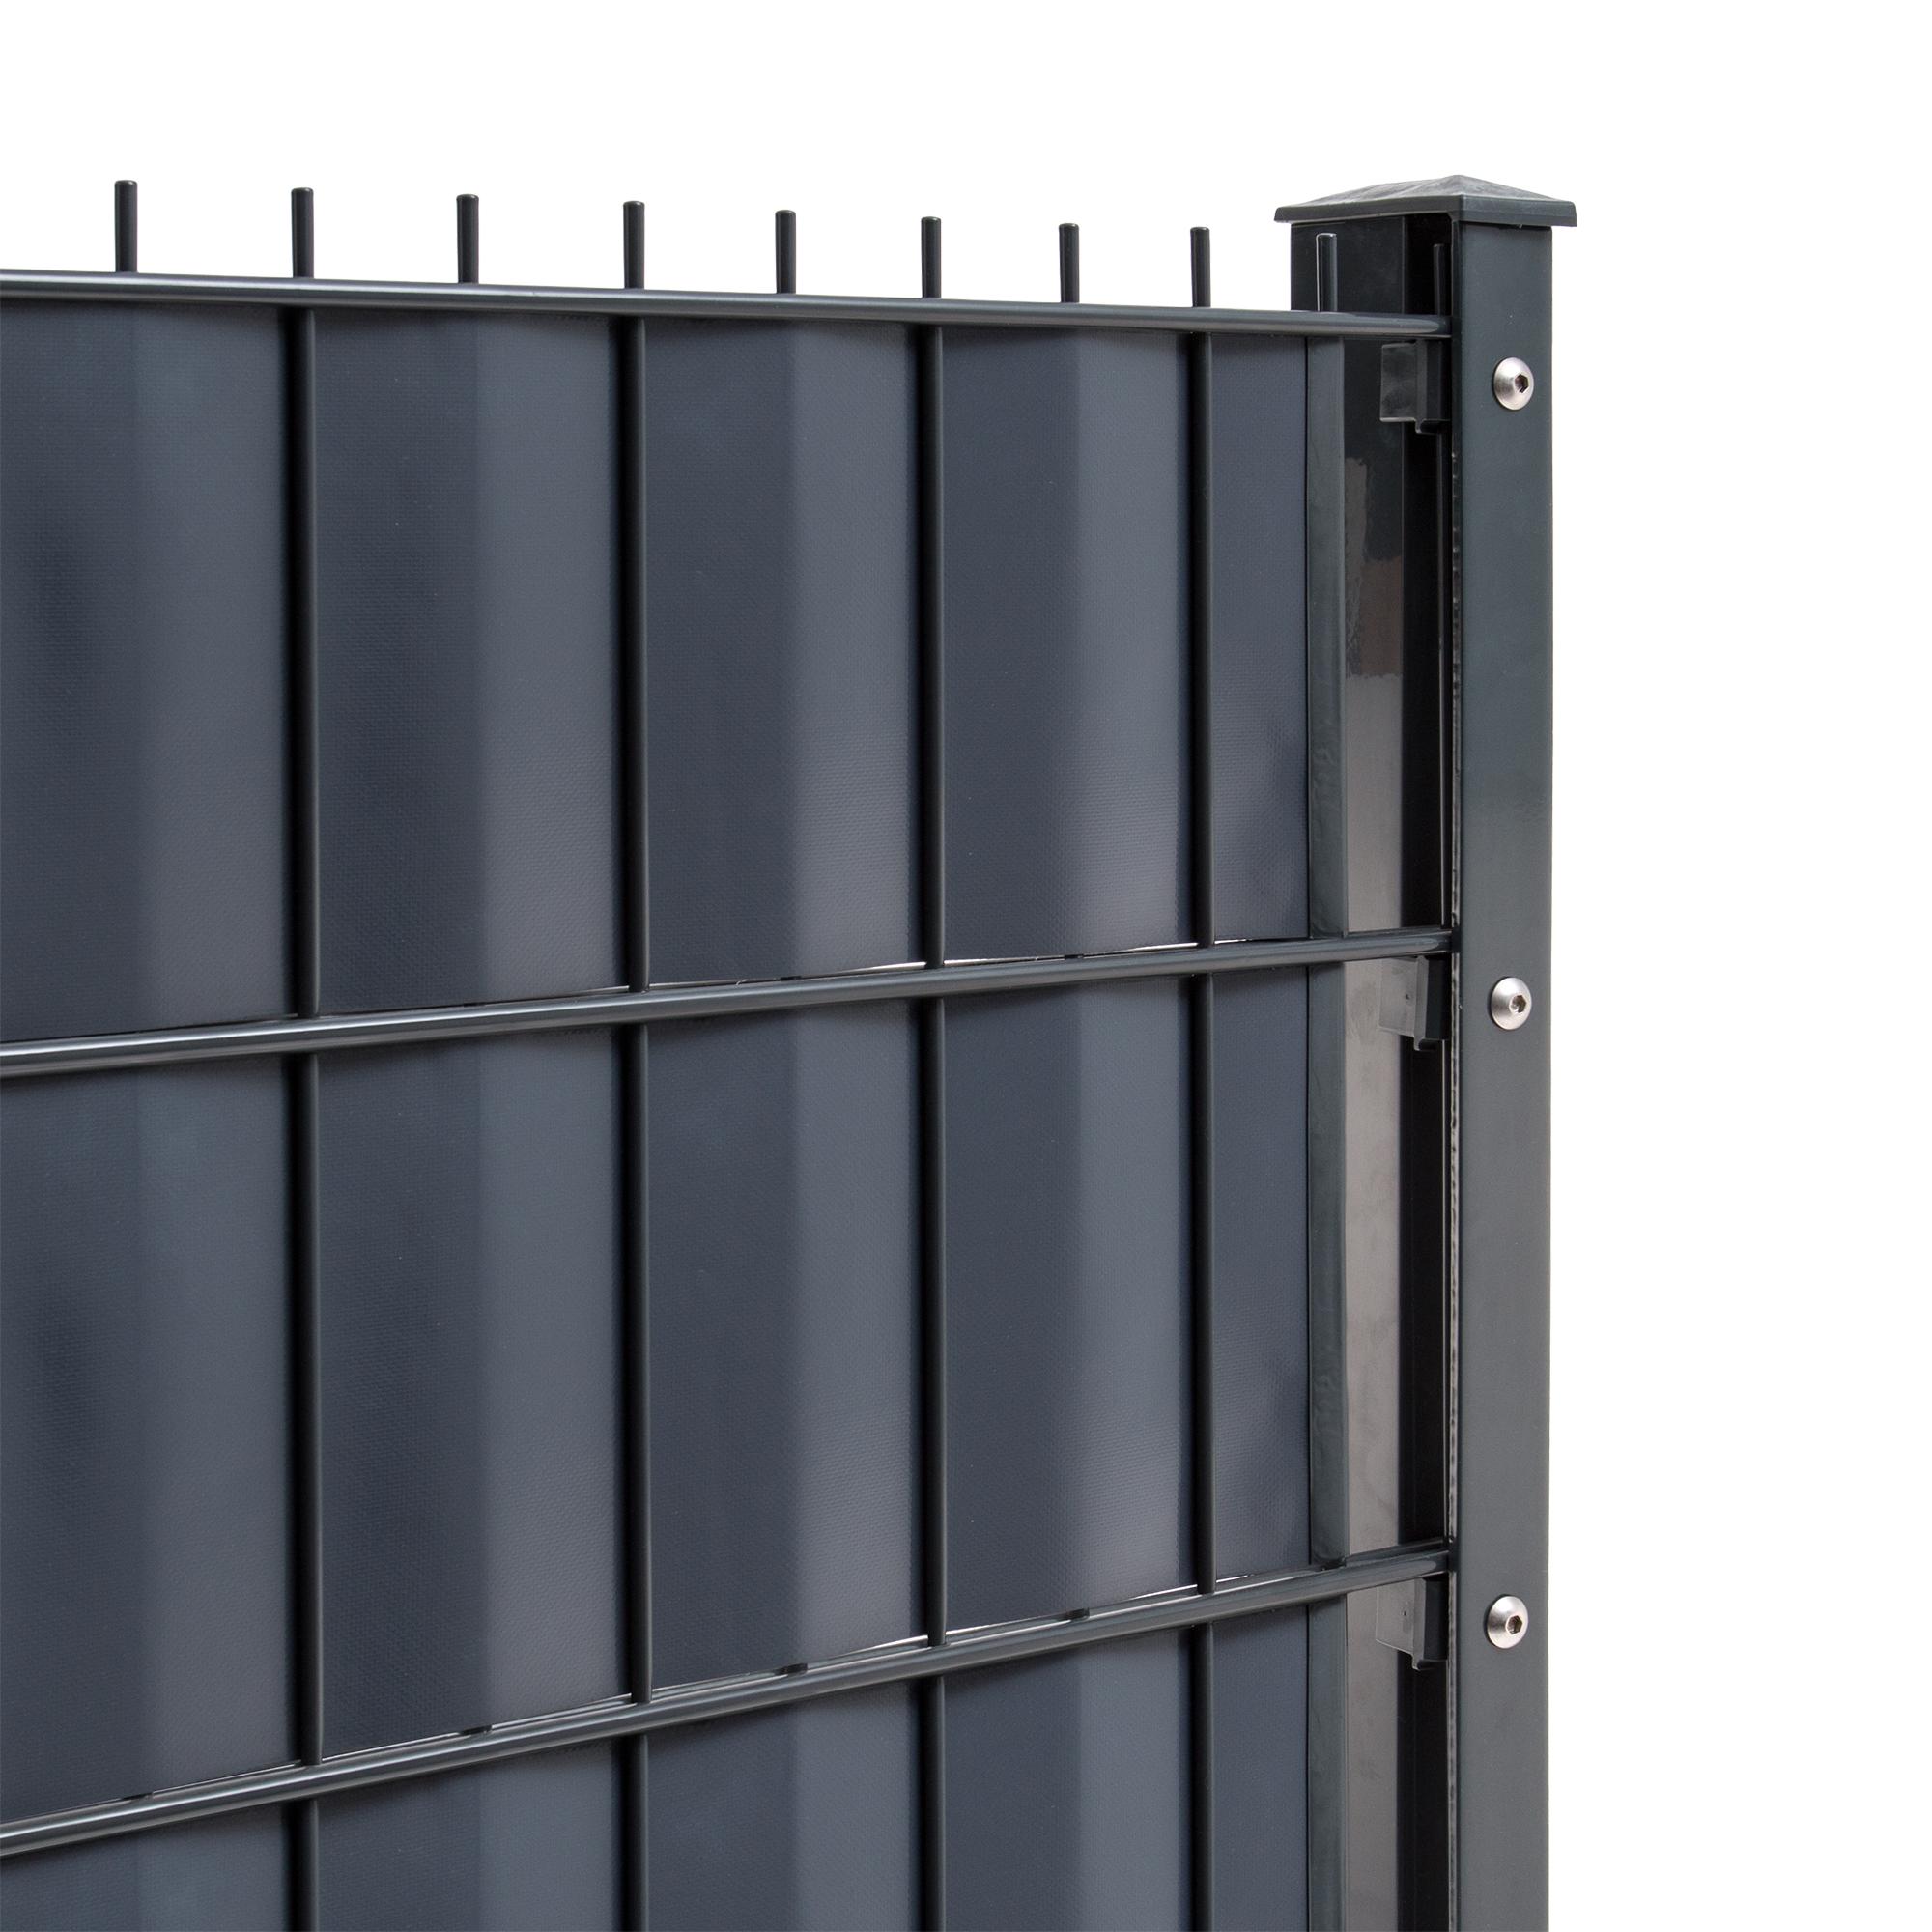 Doppelstabmattenzaun Pfosten Sichtschutz Gartenzaun Zäune